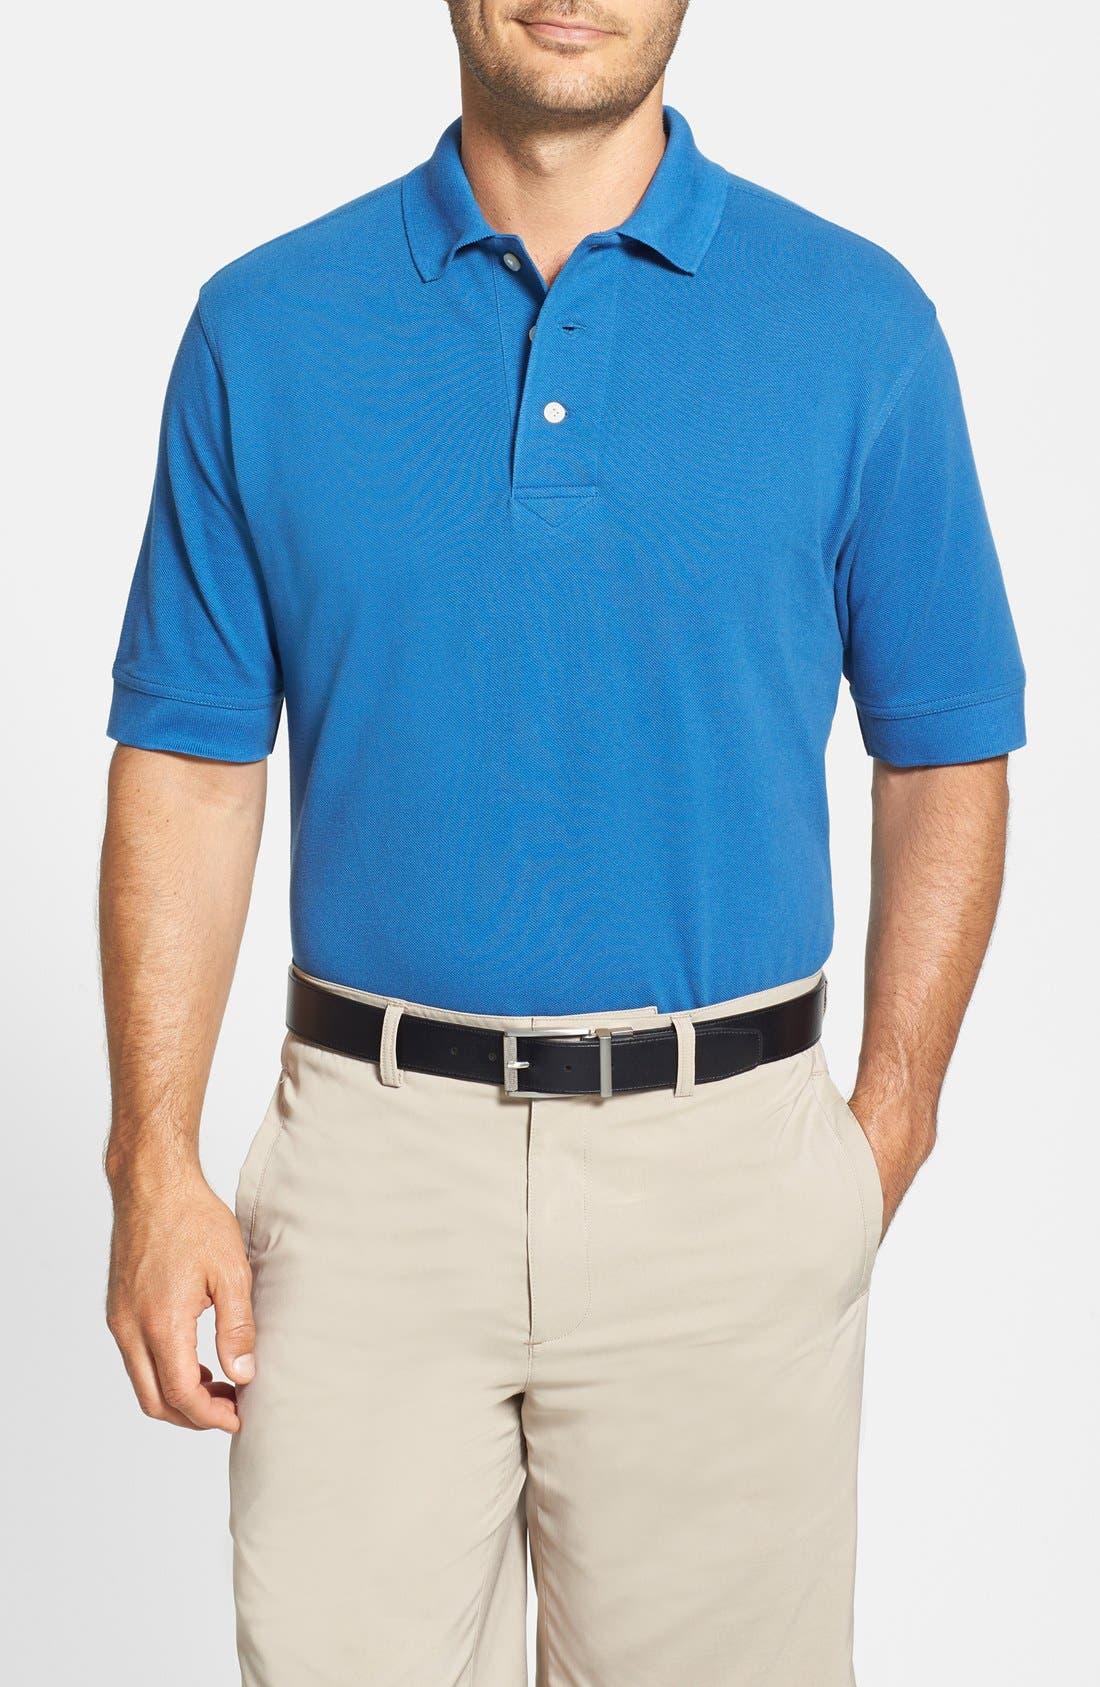 Alternate Image 1 Selected - Cutter & Buck 'Tournament' Piqué Golf Polo